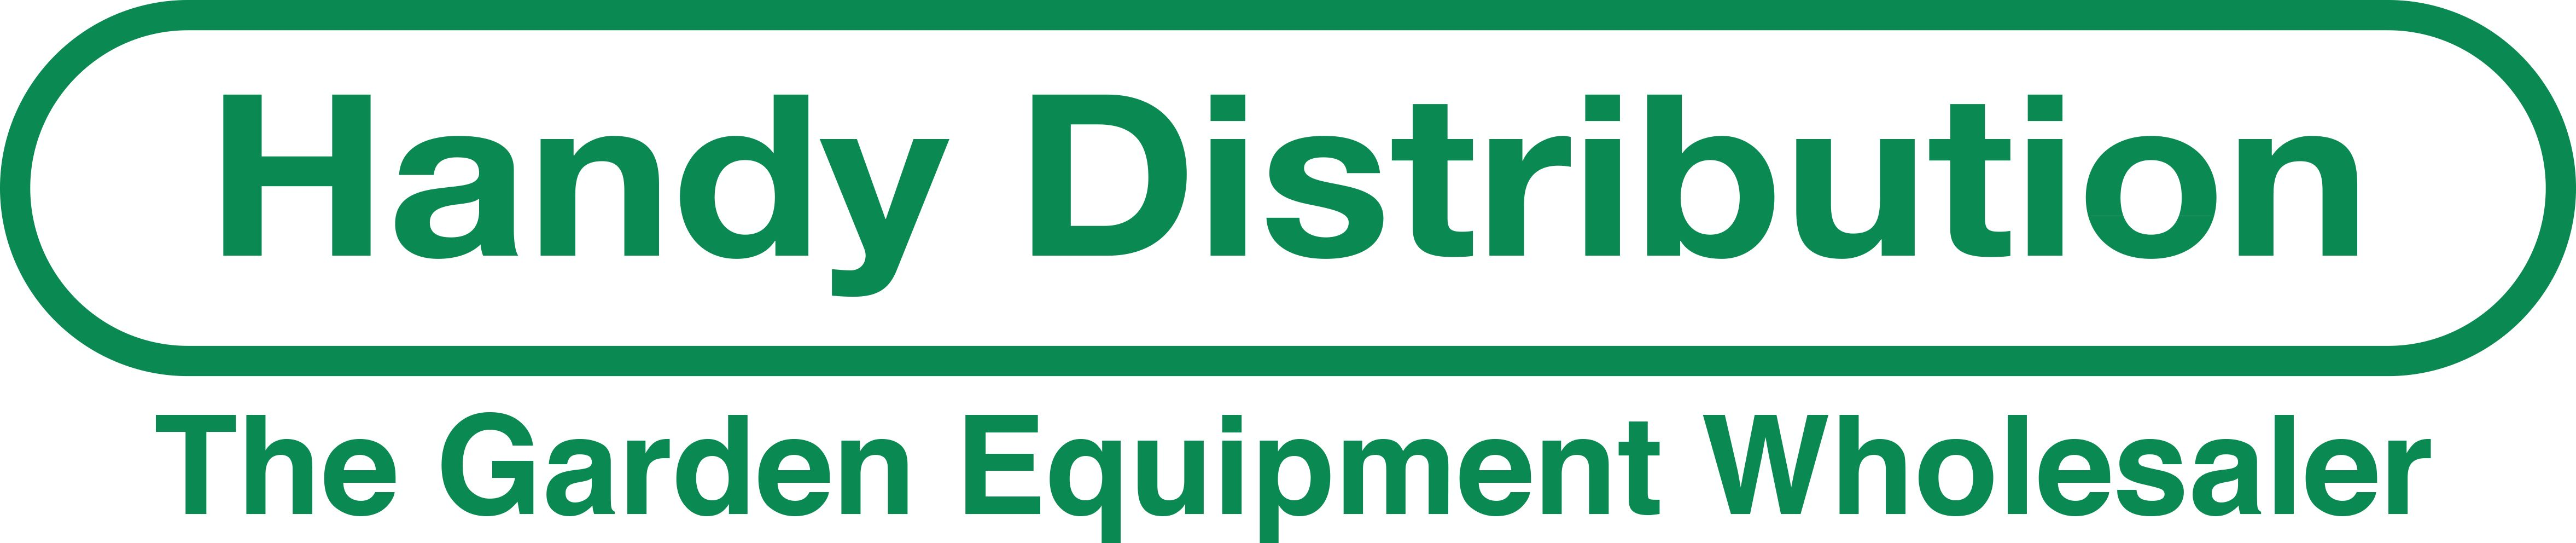 Handy Distribution